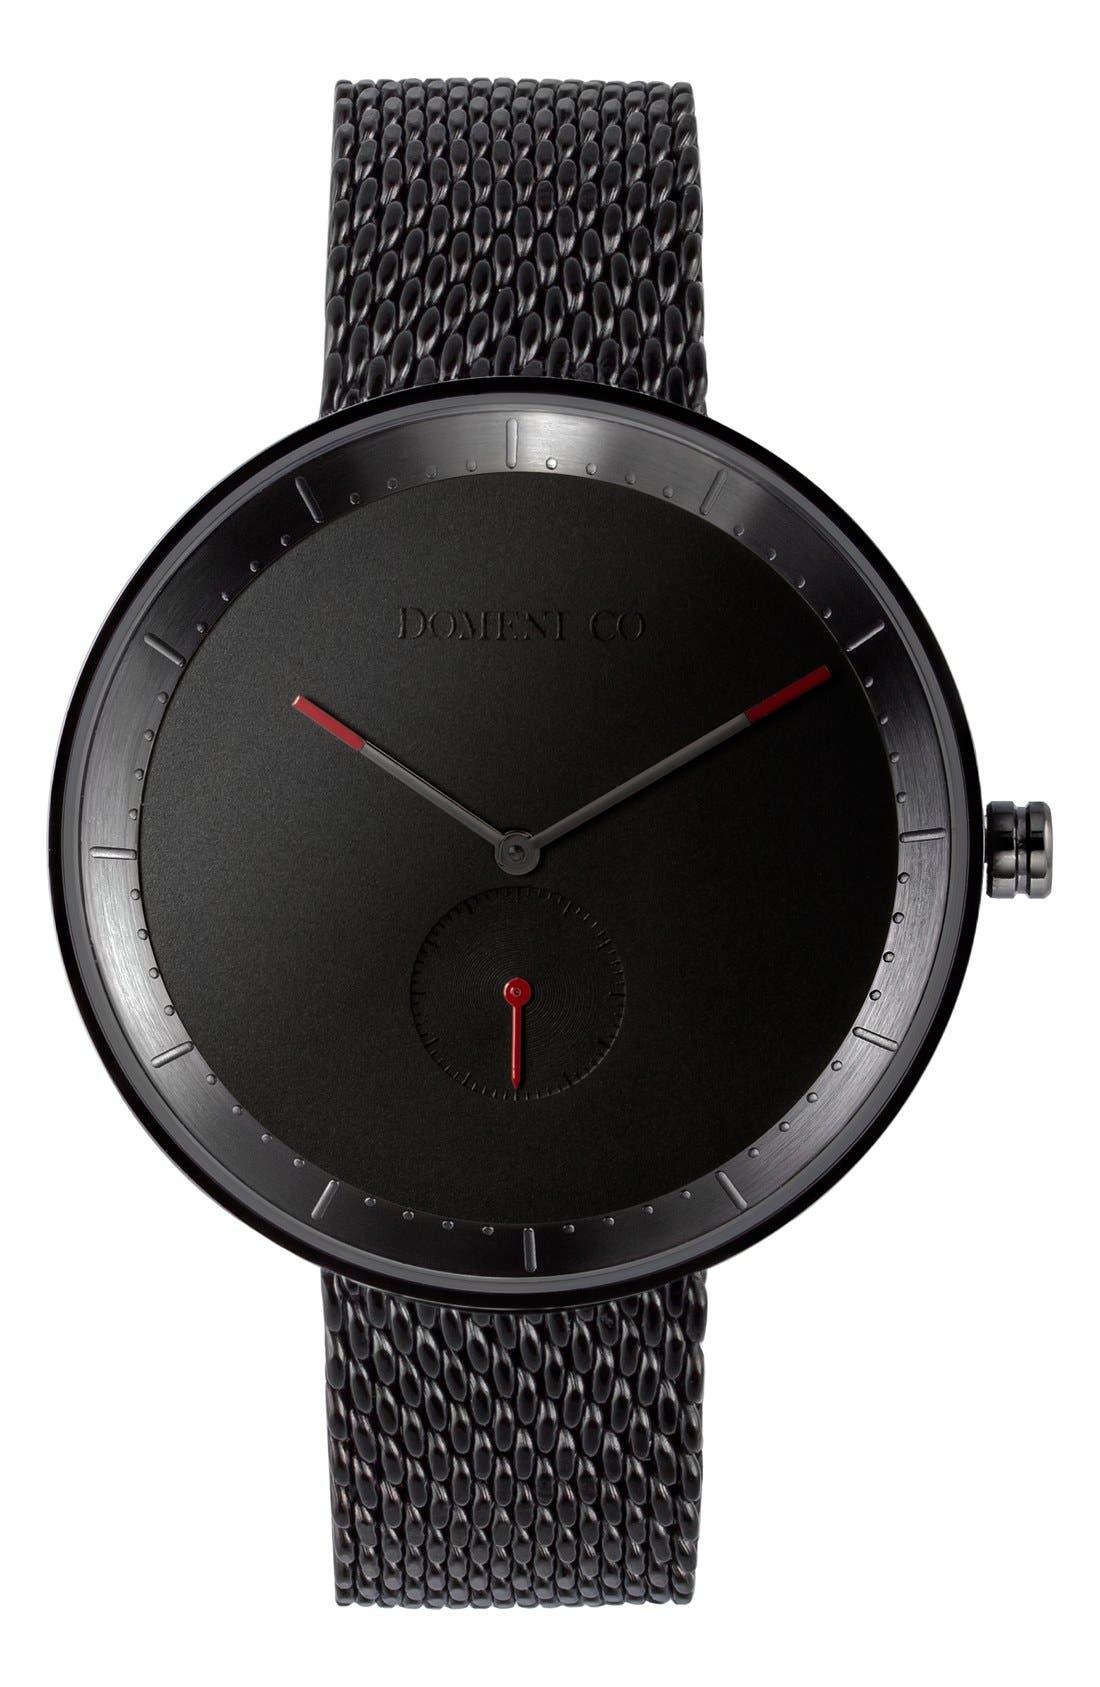 Alternate Image 1 Selected - Domeni 'Signature' Mesh Strap Watch, 40mm